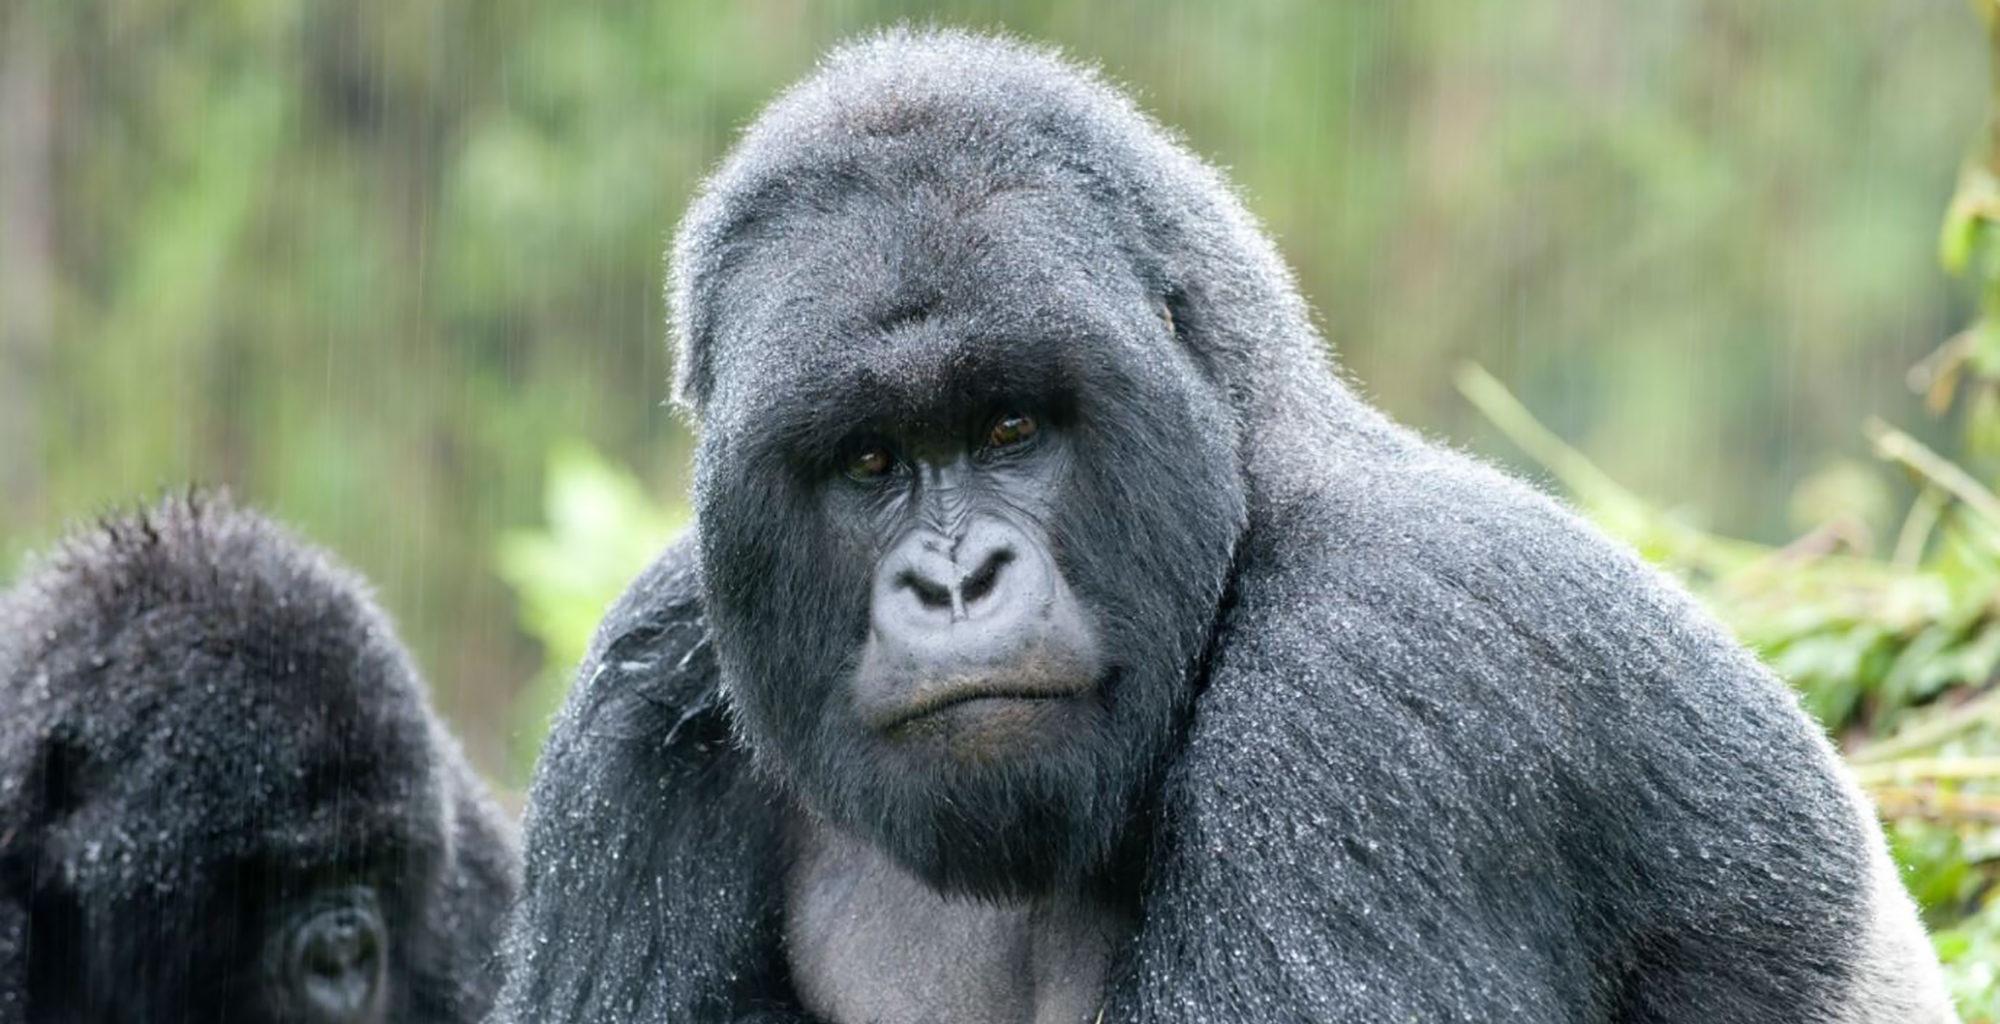 Uganda-Mount-Gahinga-Gorilla